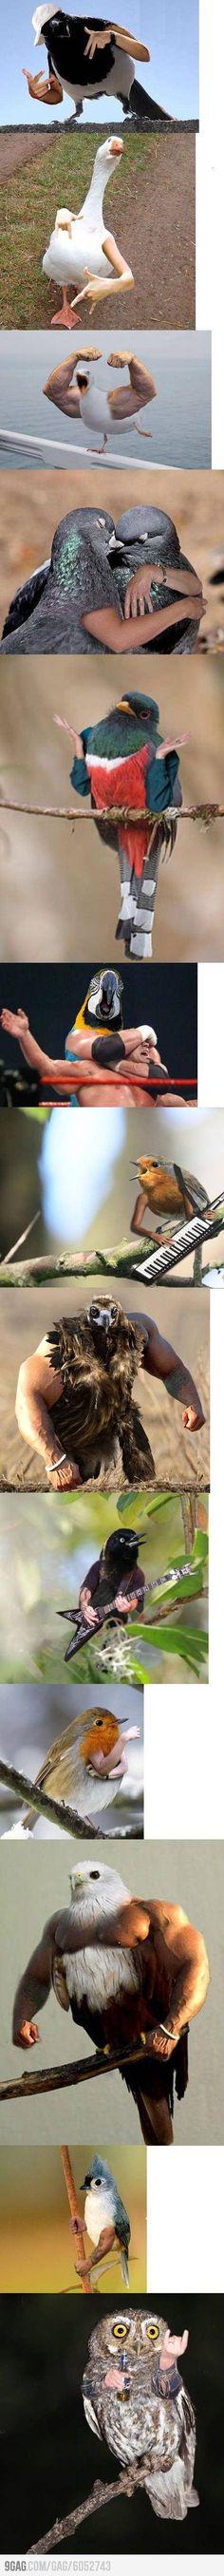 Birds with arms, weirdest thing everrrr!!